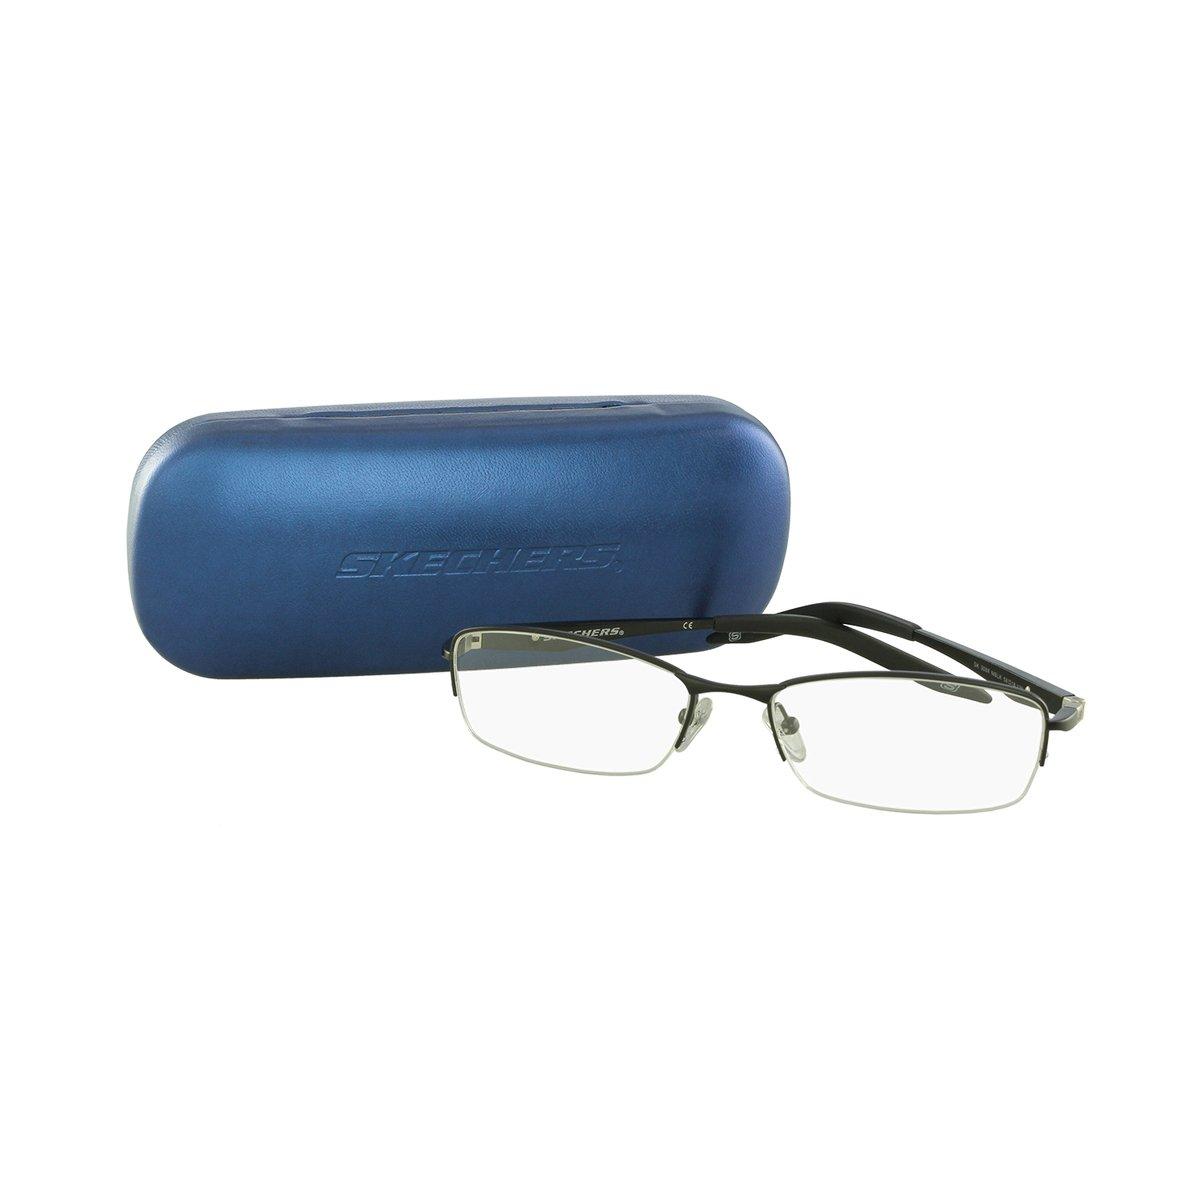 45366ec434ac7 Óculos de Grau Unissex Skechers Casual Preto - Preto - Compre Agora ...